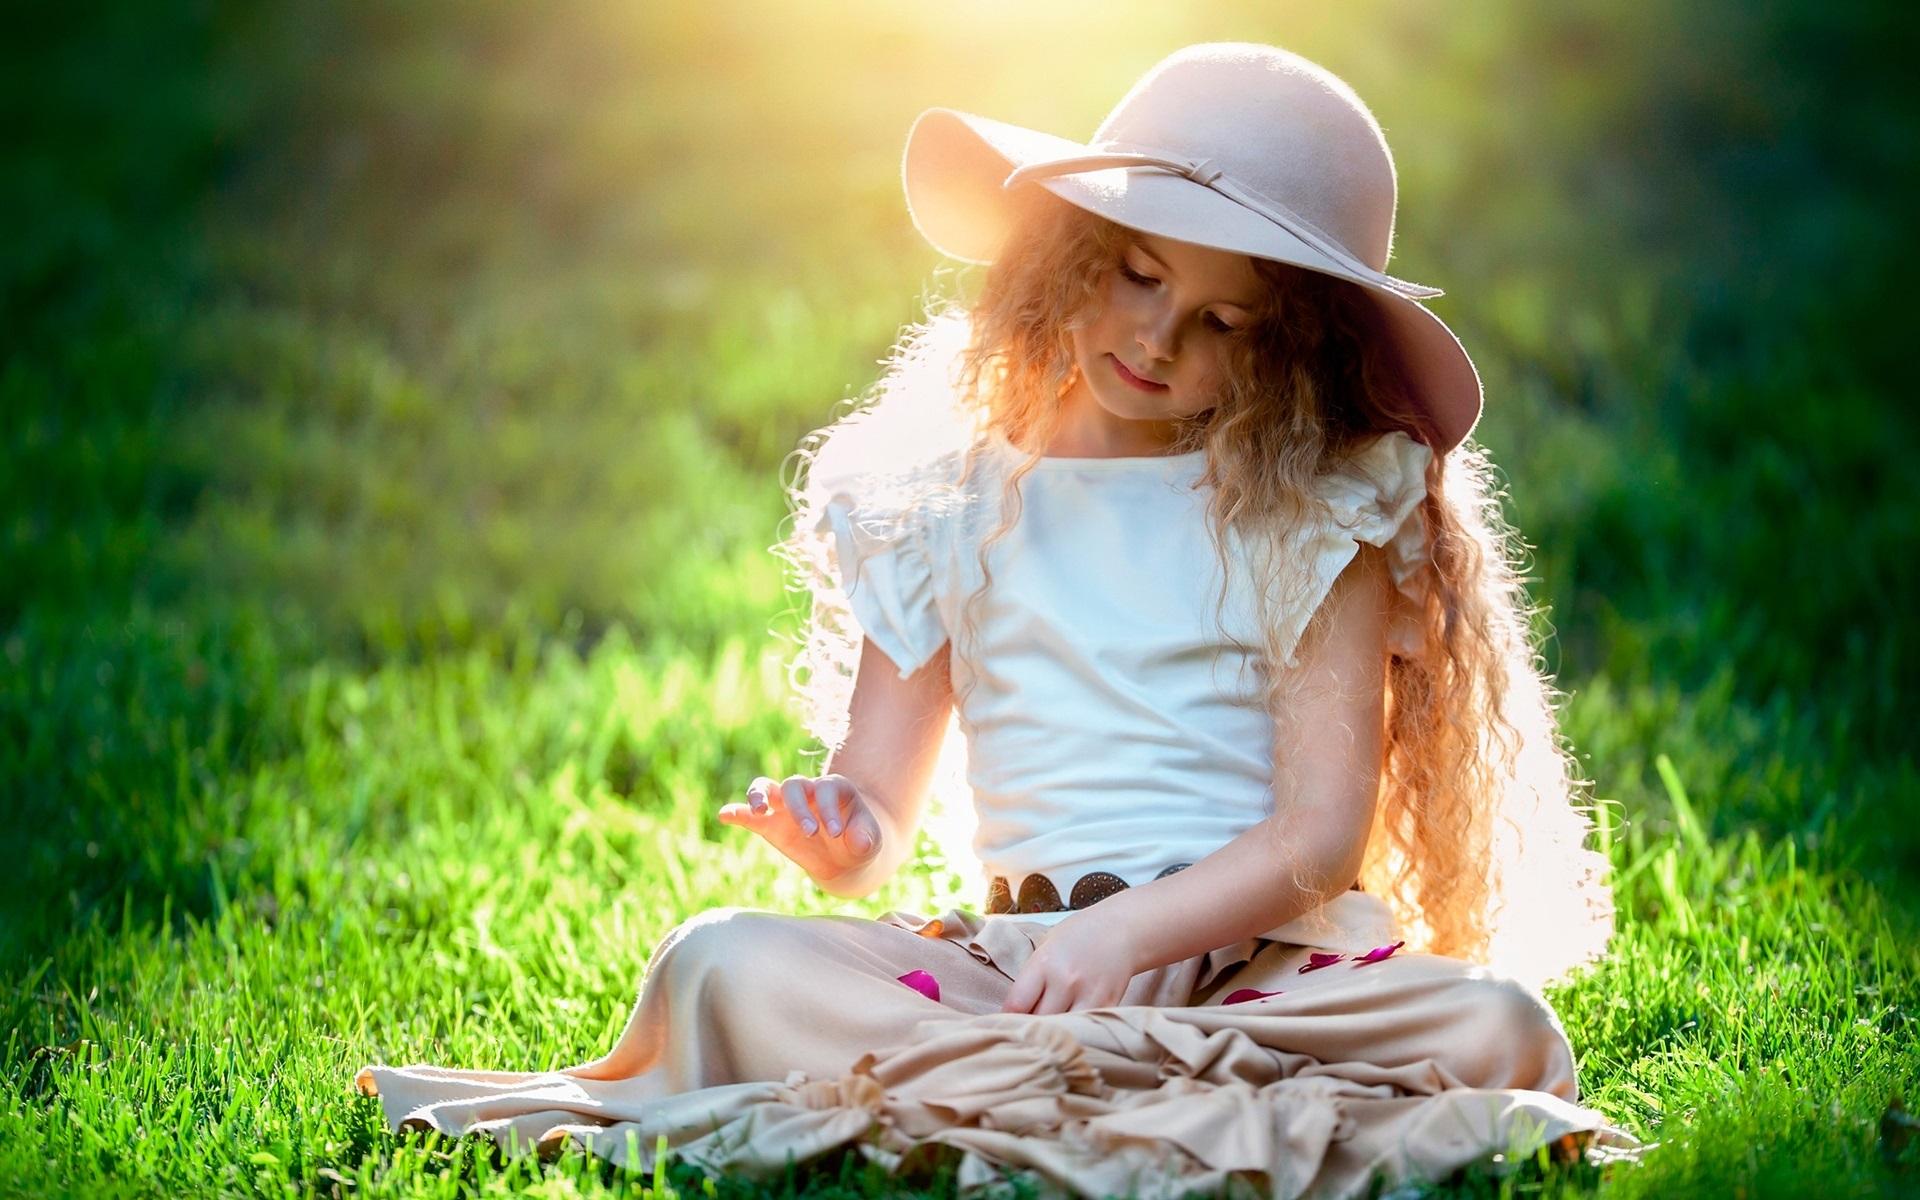 wallpaper beautiful cute girl, child, hat, grass, sun 1920x1200 hd